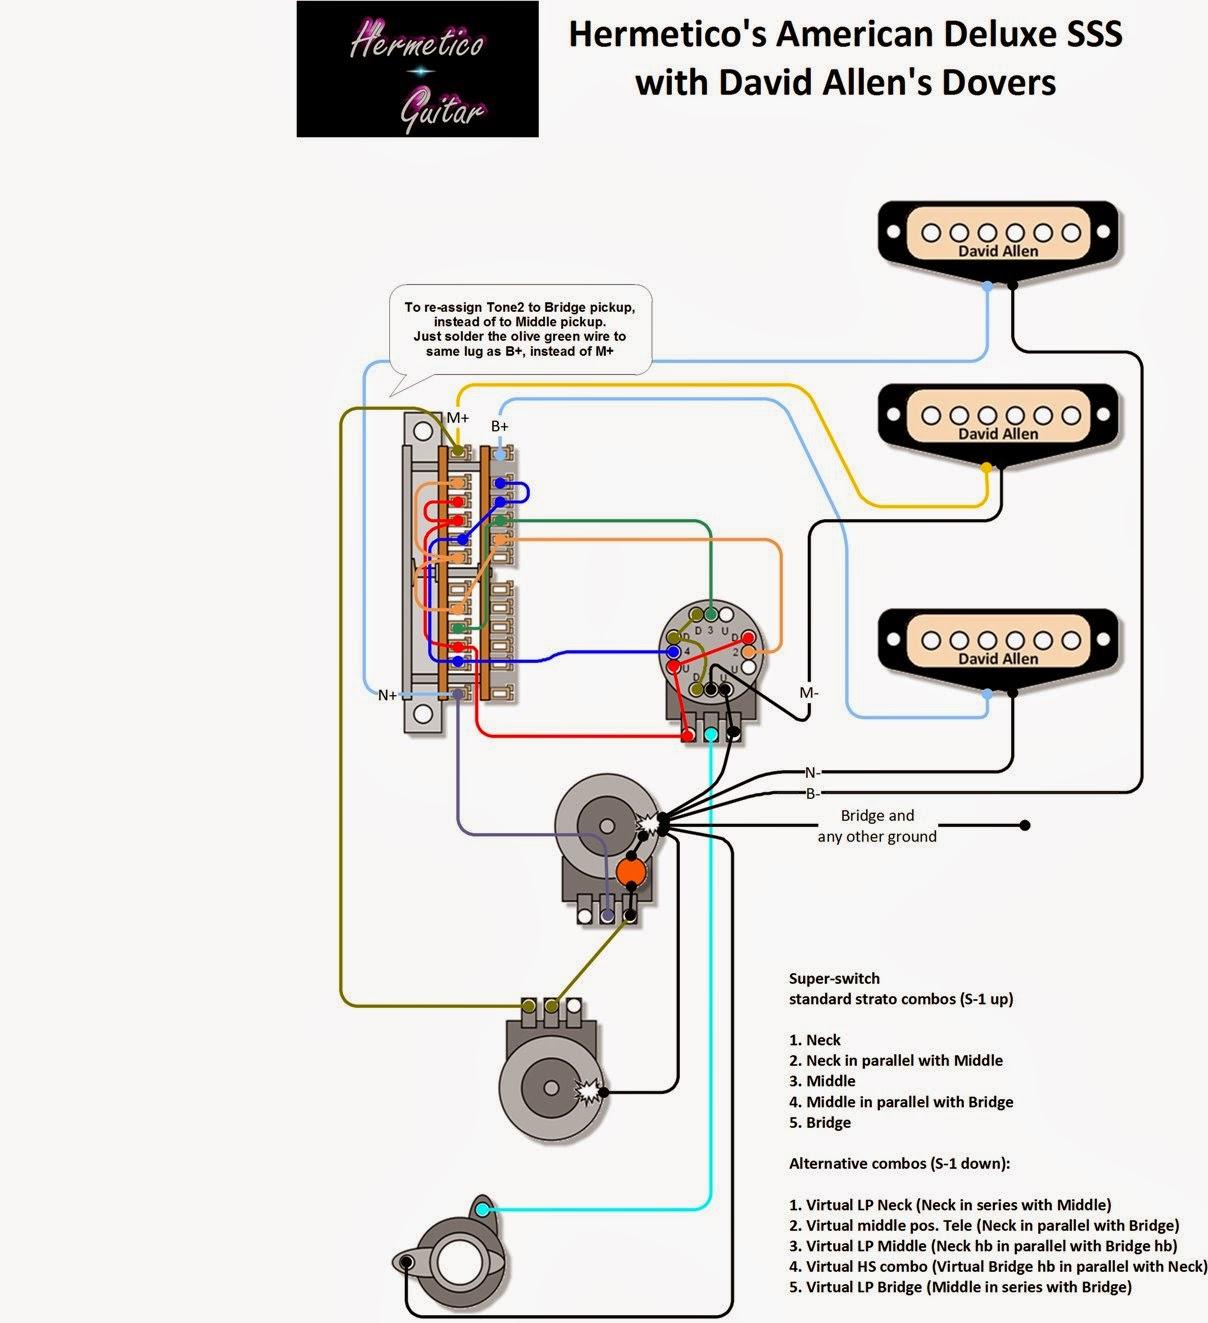 epiphone les paul flying v wiring diagram wiring diagram for 58 gibson flying v wiring diagram gibson flying v controls les paul standard wiring diagram les